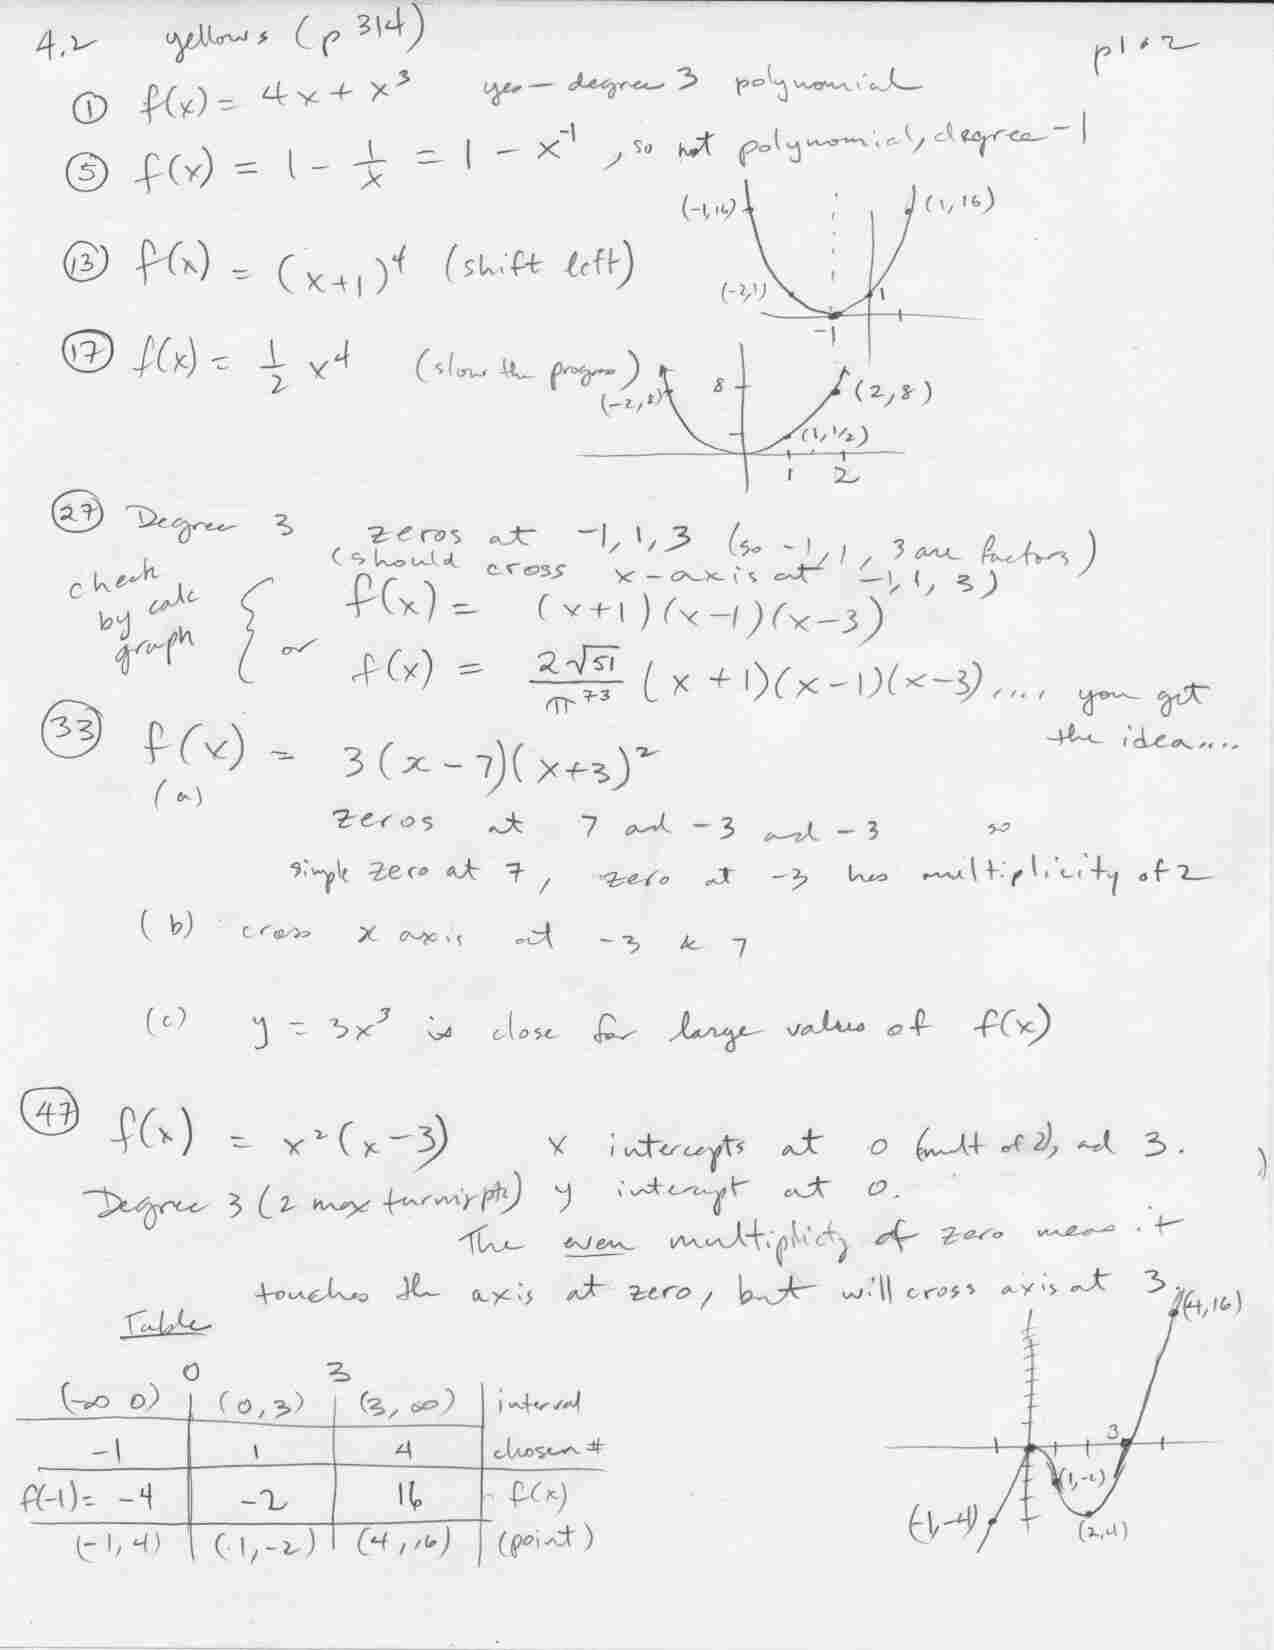 Algebra 3 4 Complex Numbers Worksheet Answers